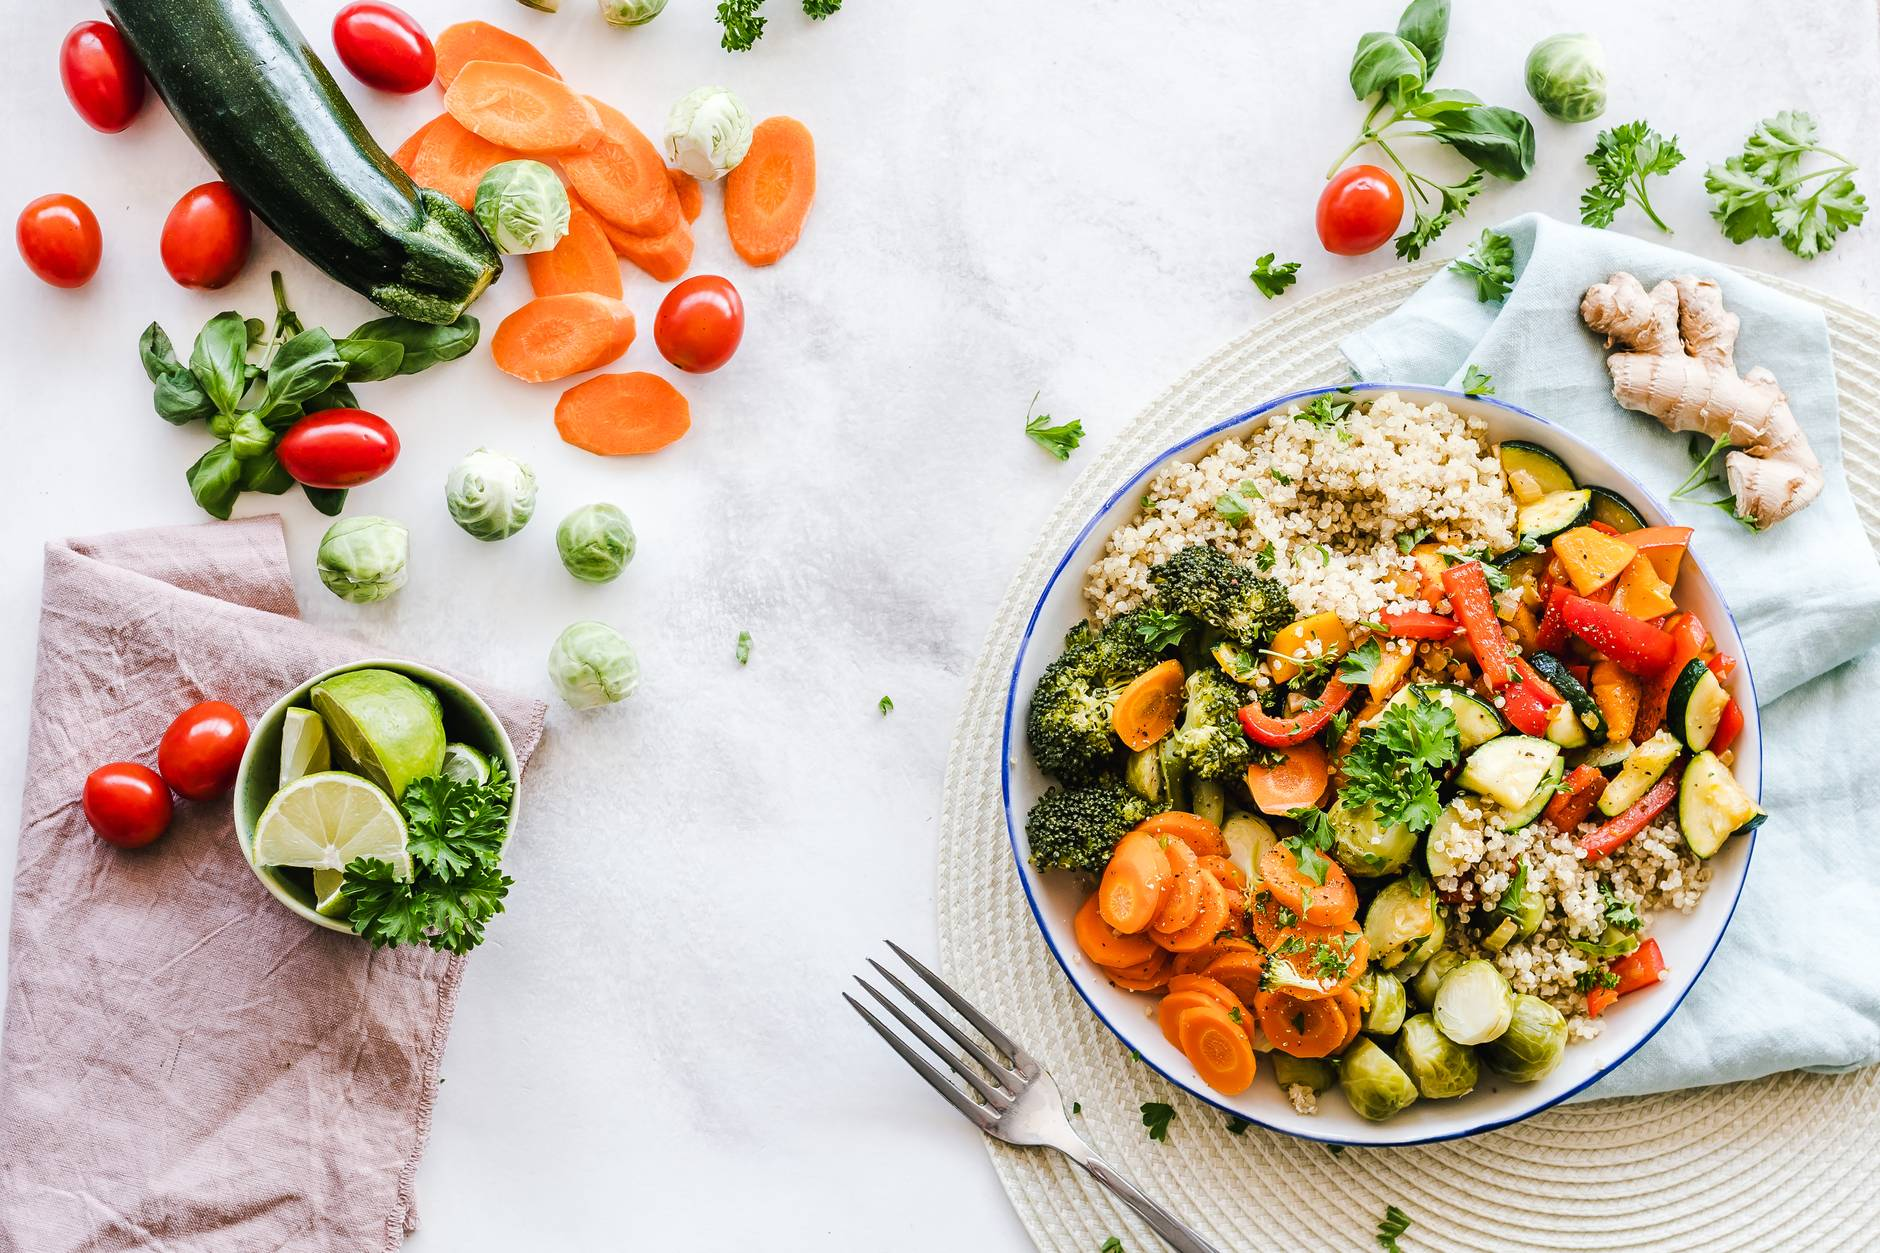 vegetables, satvik eating, health conscious, physical body healing, pranamaya kosha diet, heal subtle body through food